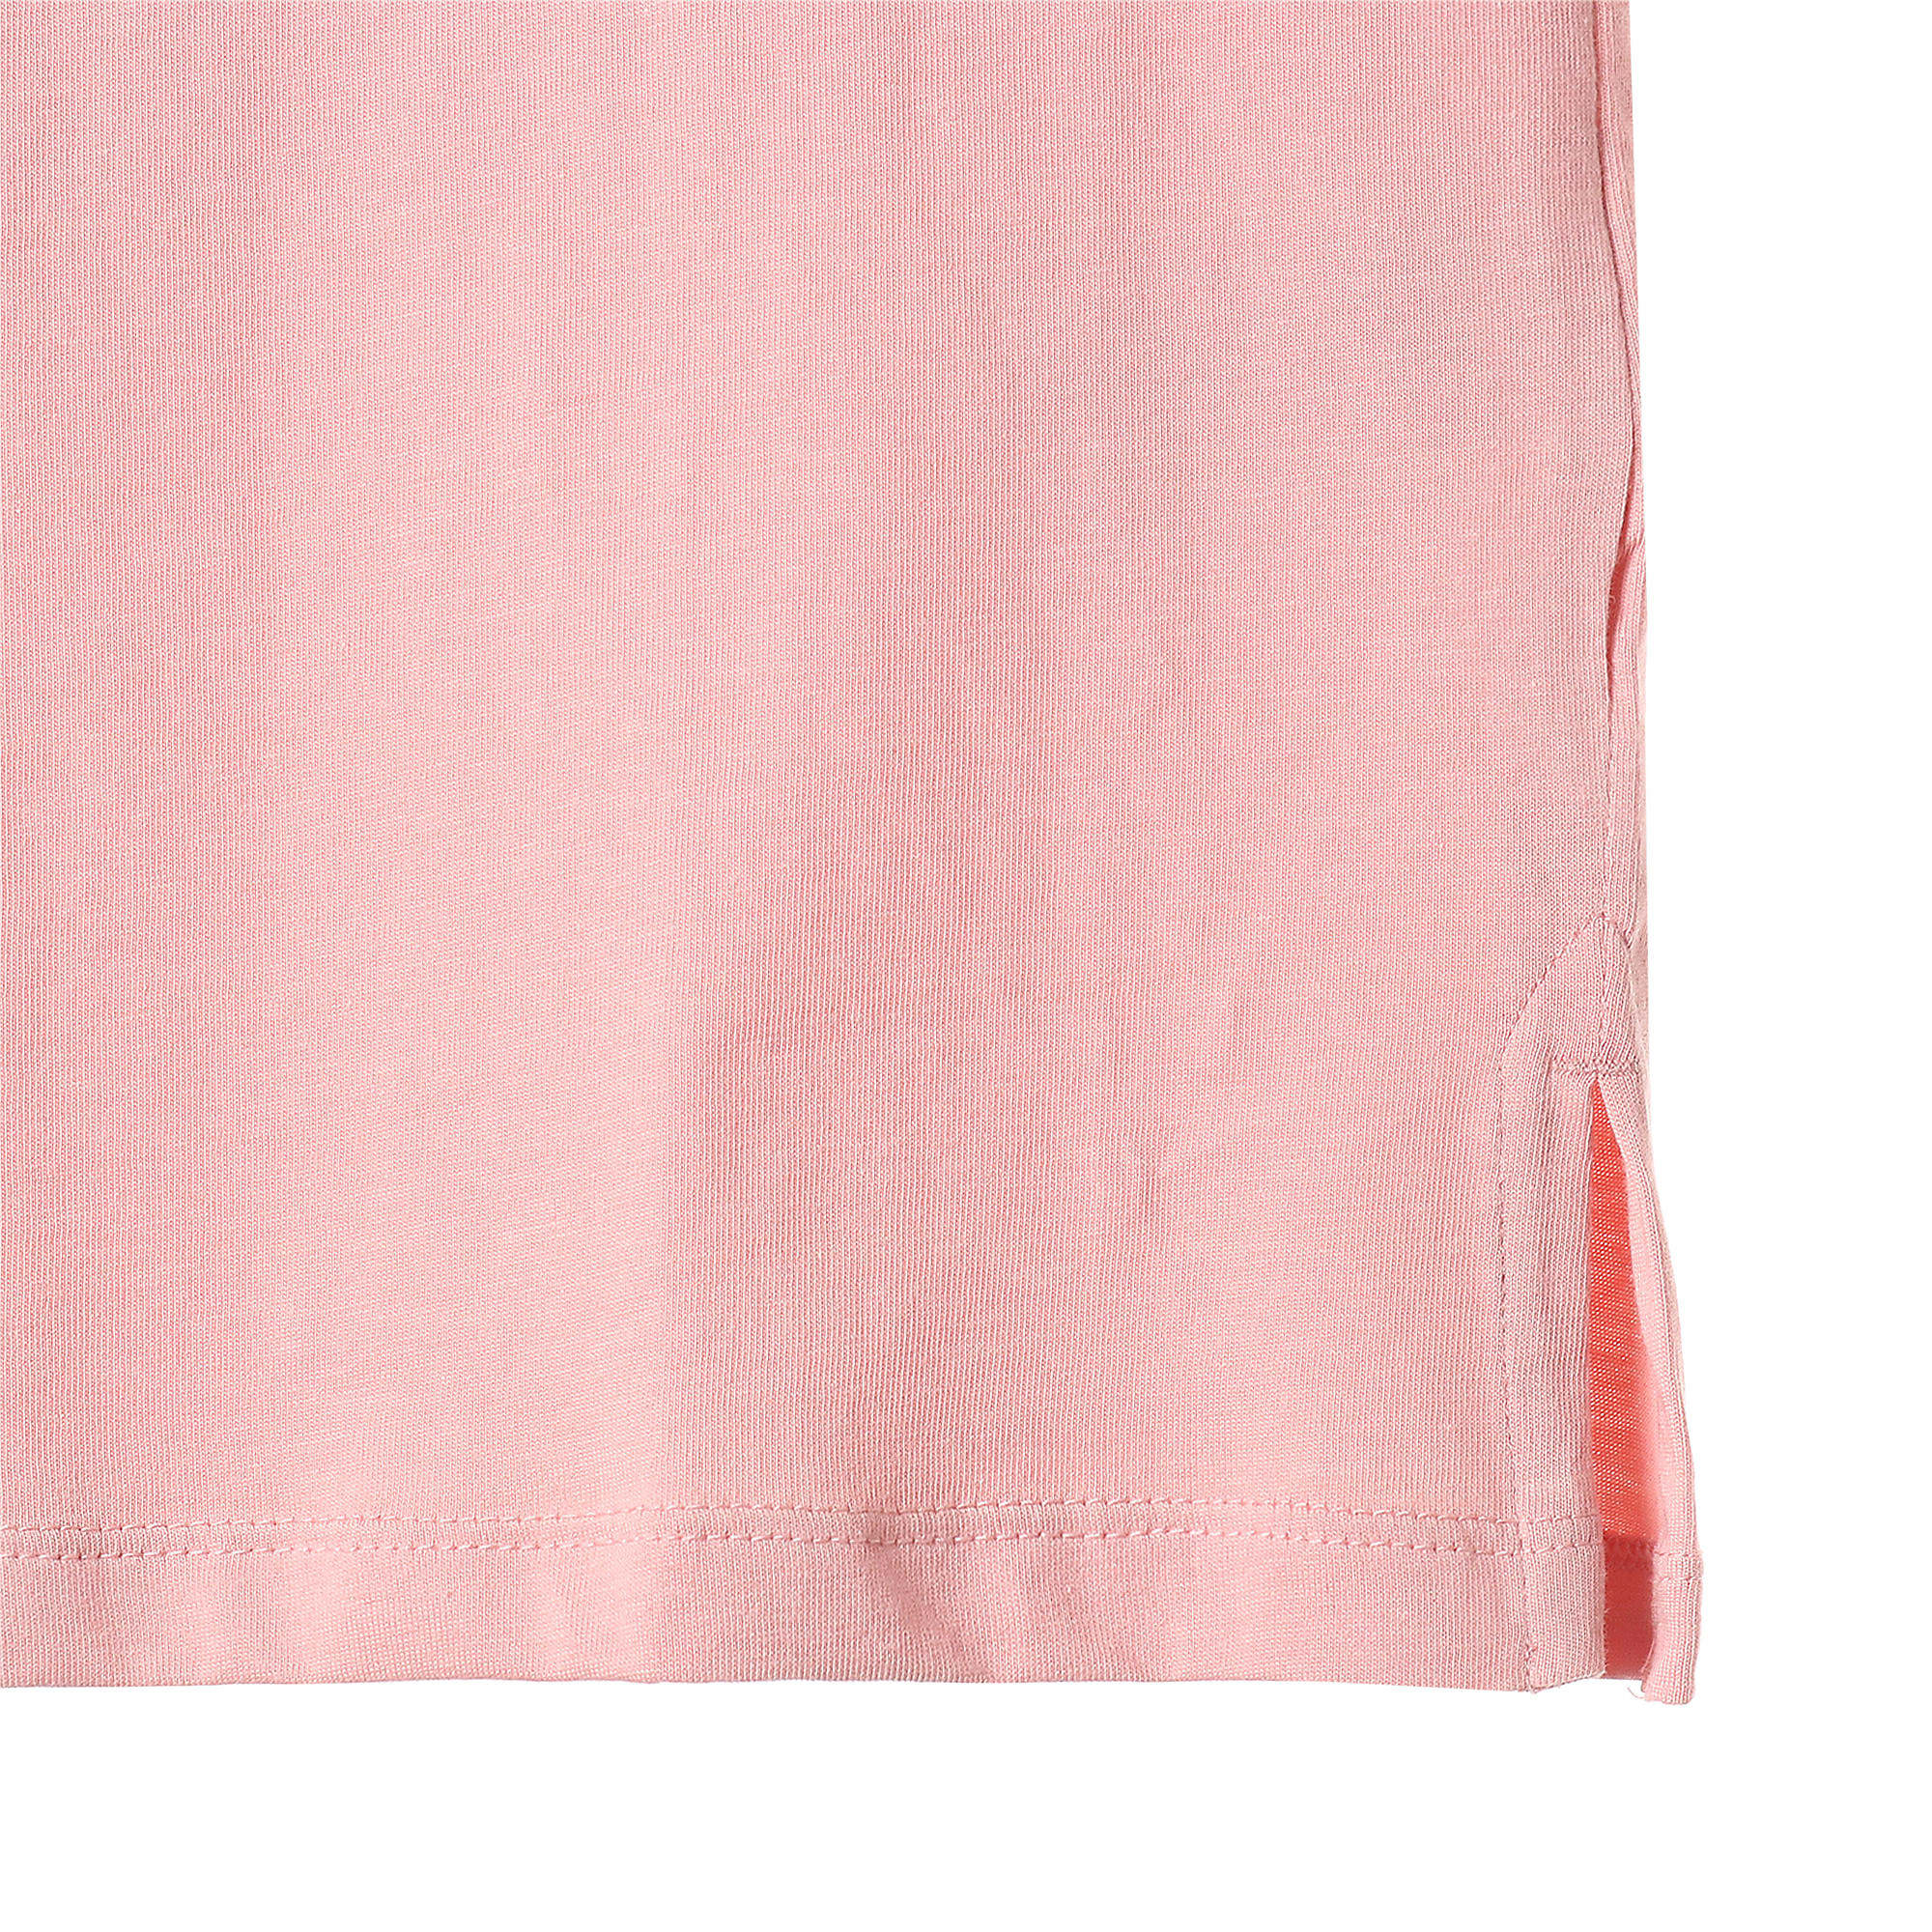 Thumbnail 6 of CLOUD パック ウィメンズ グラフィック Tシャツ, Bridal Rose, medium-JPN